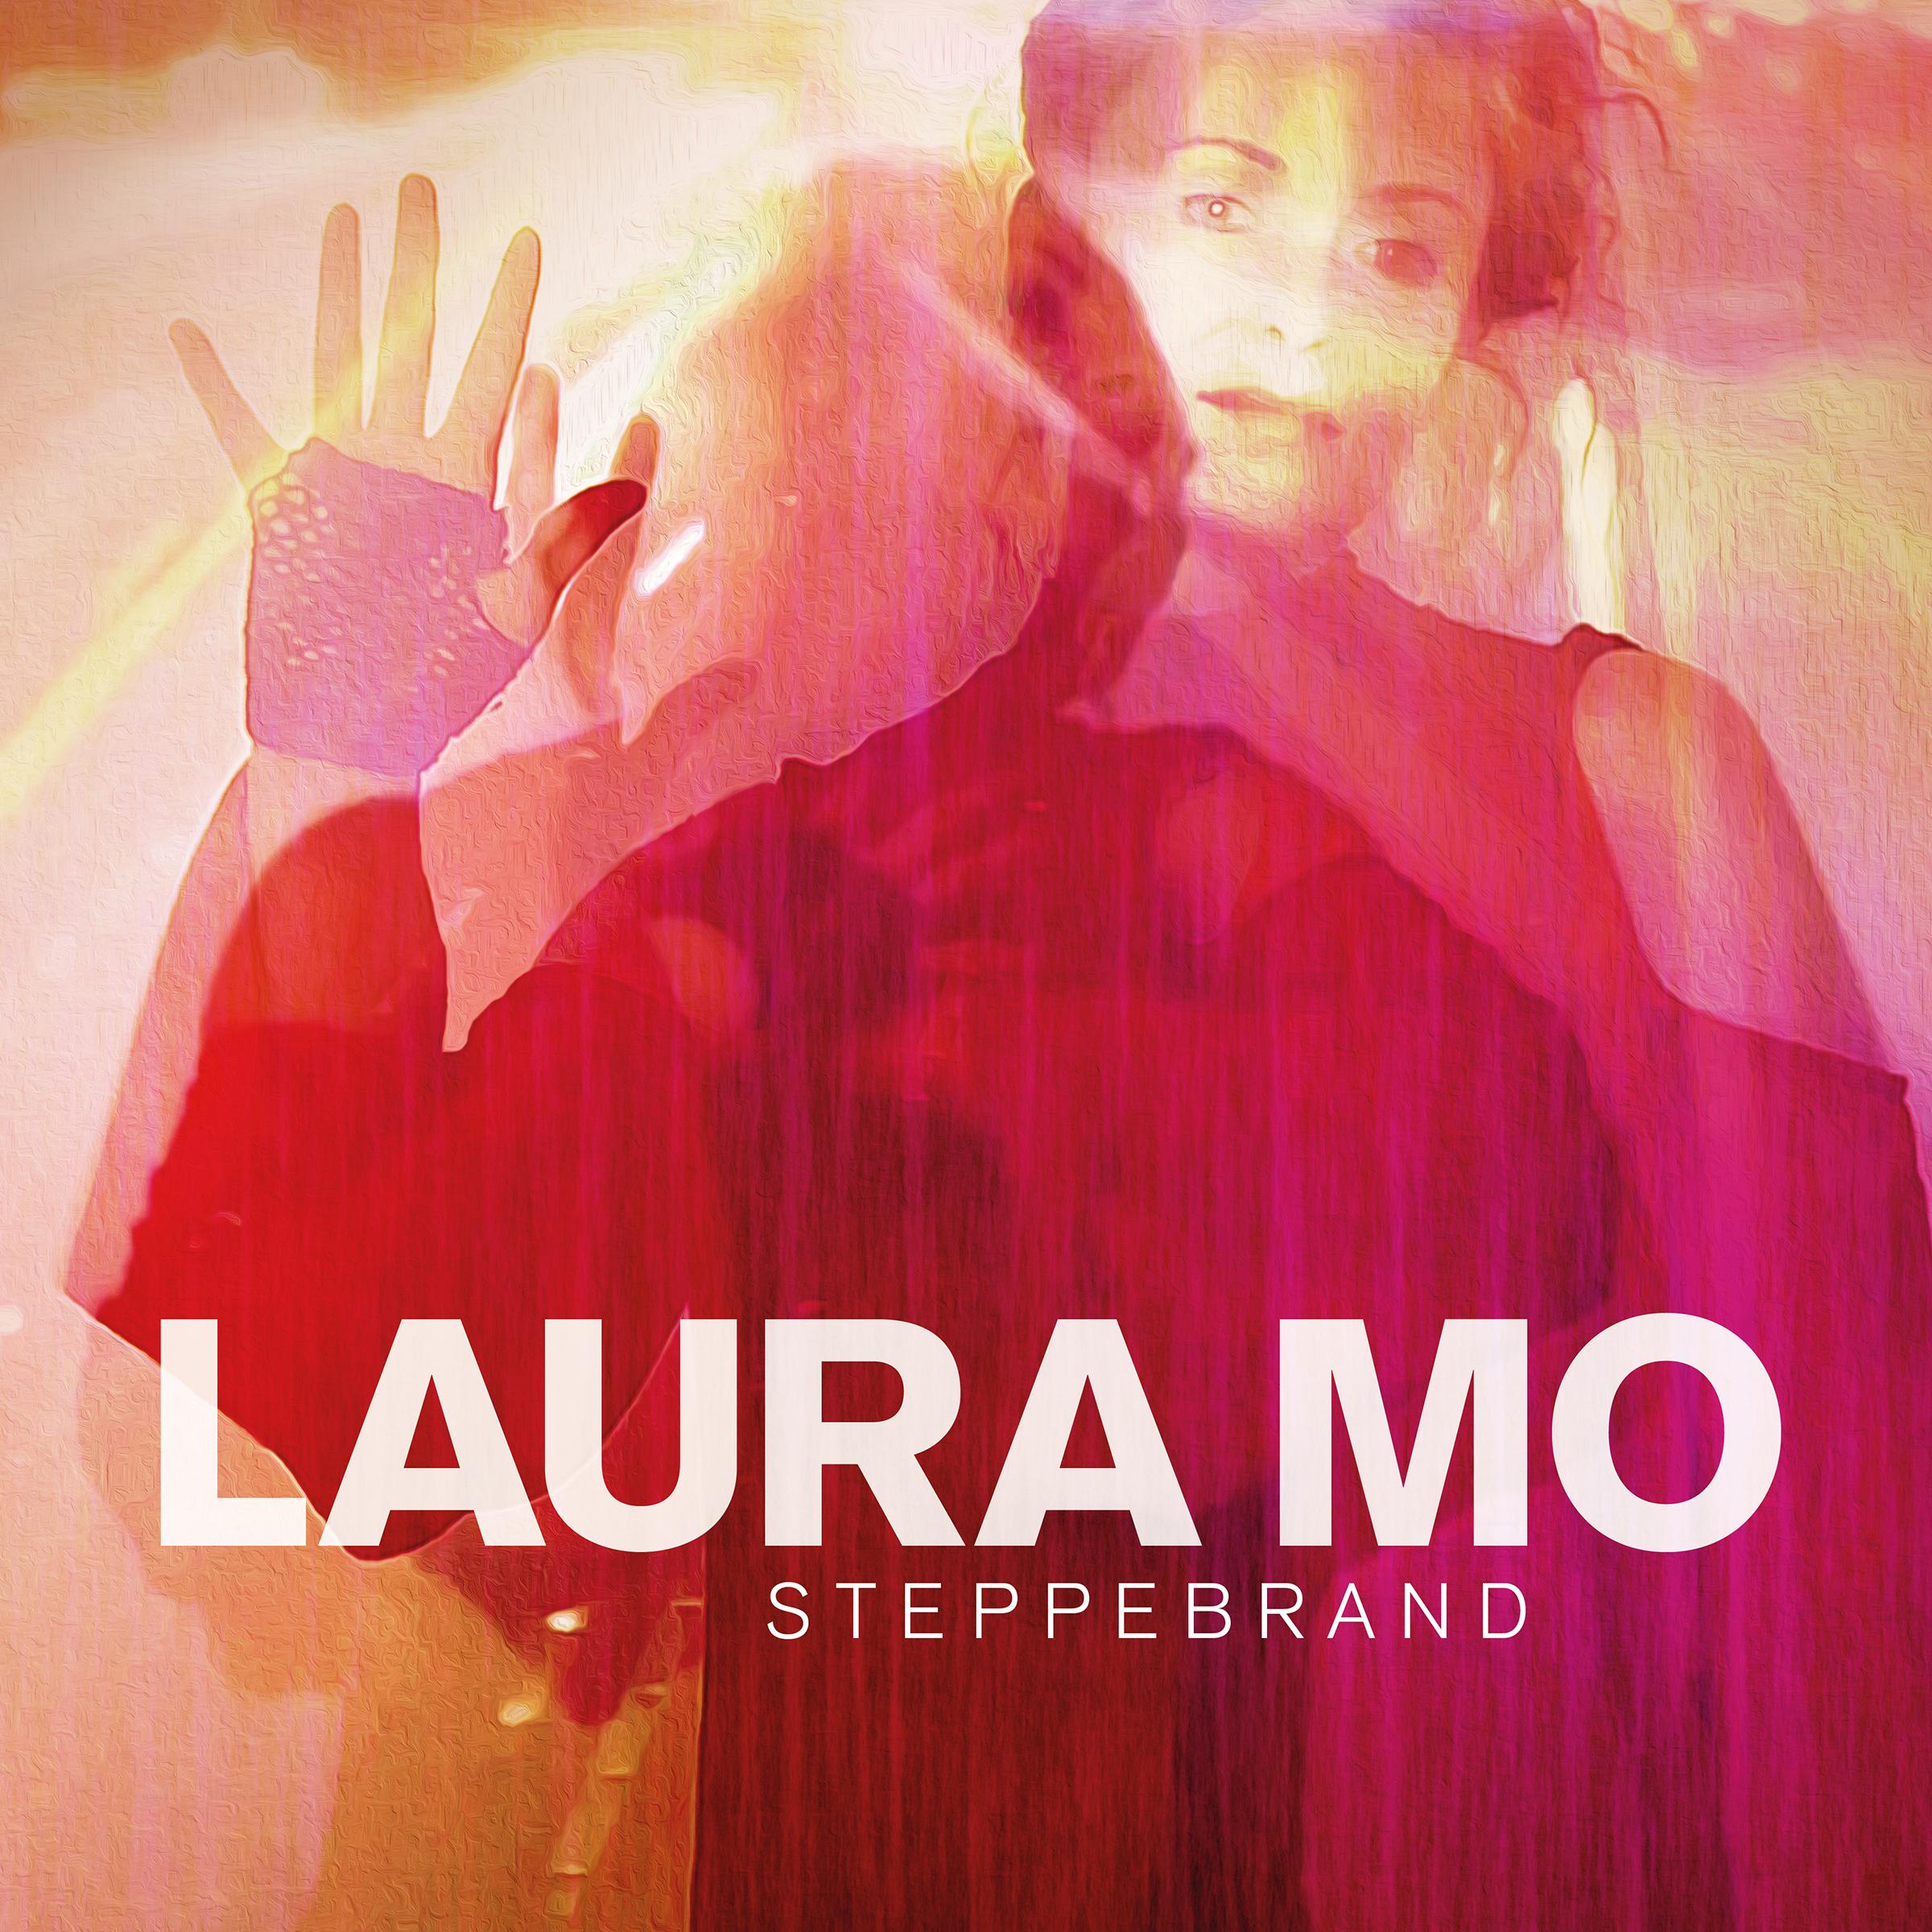 Steppebrand - Laura Mo - Musik -  - 0602567492436 - April 6, 2018